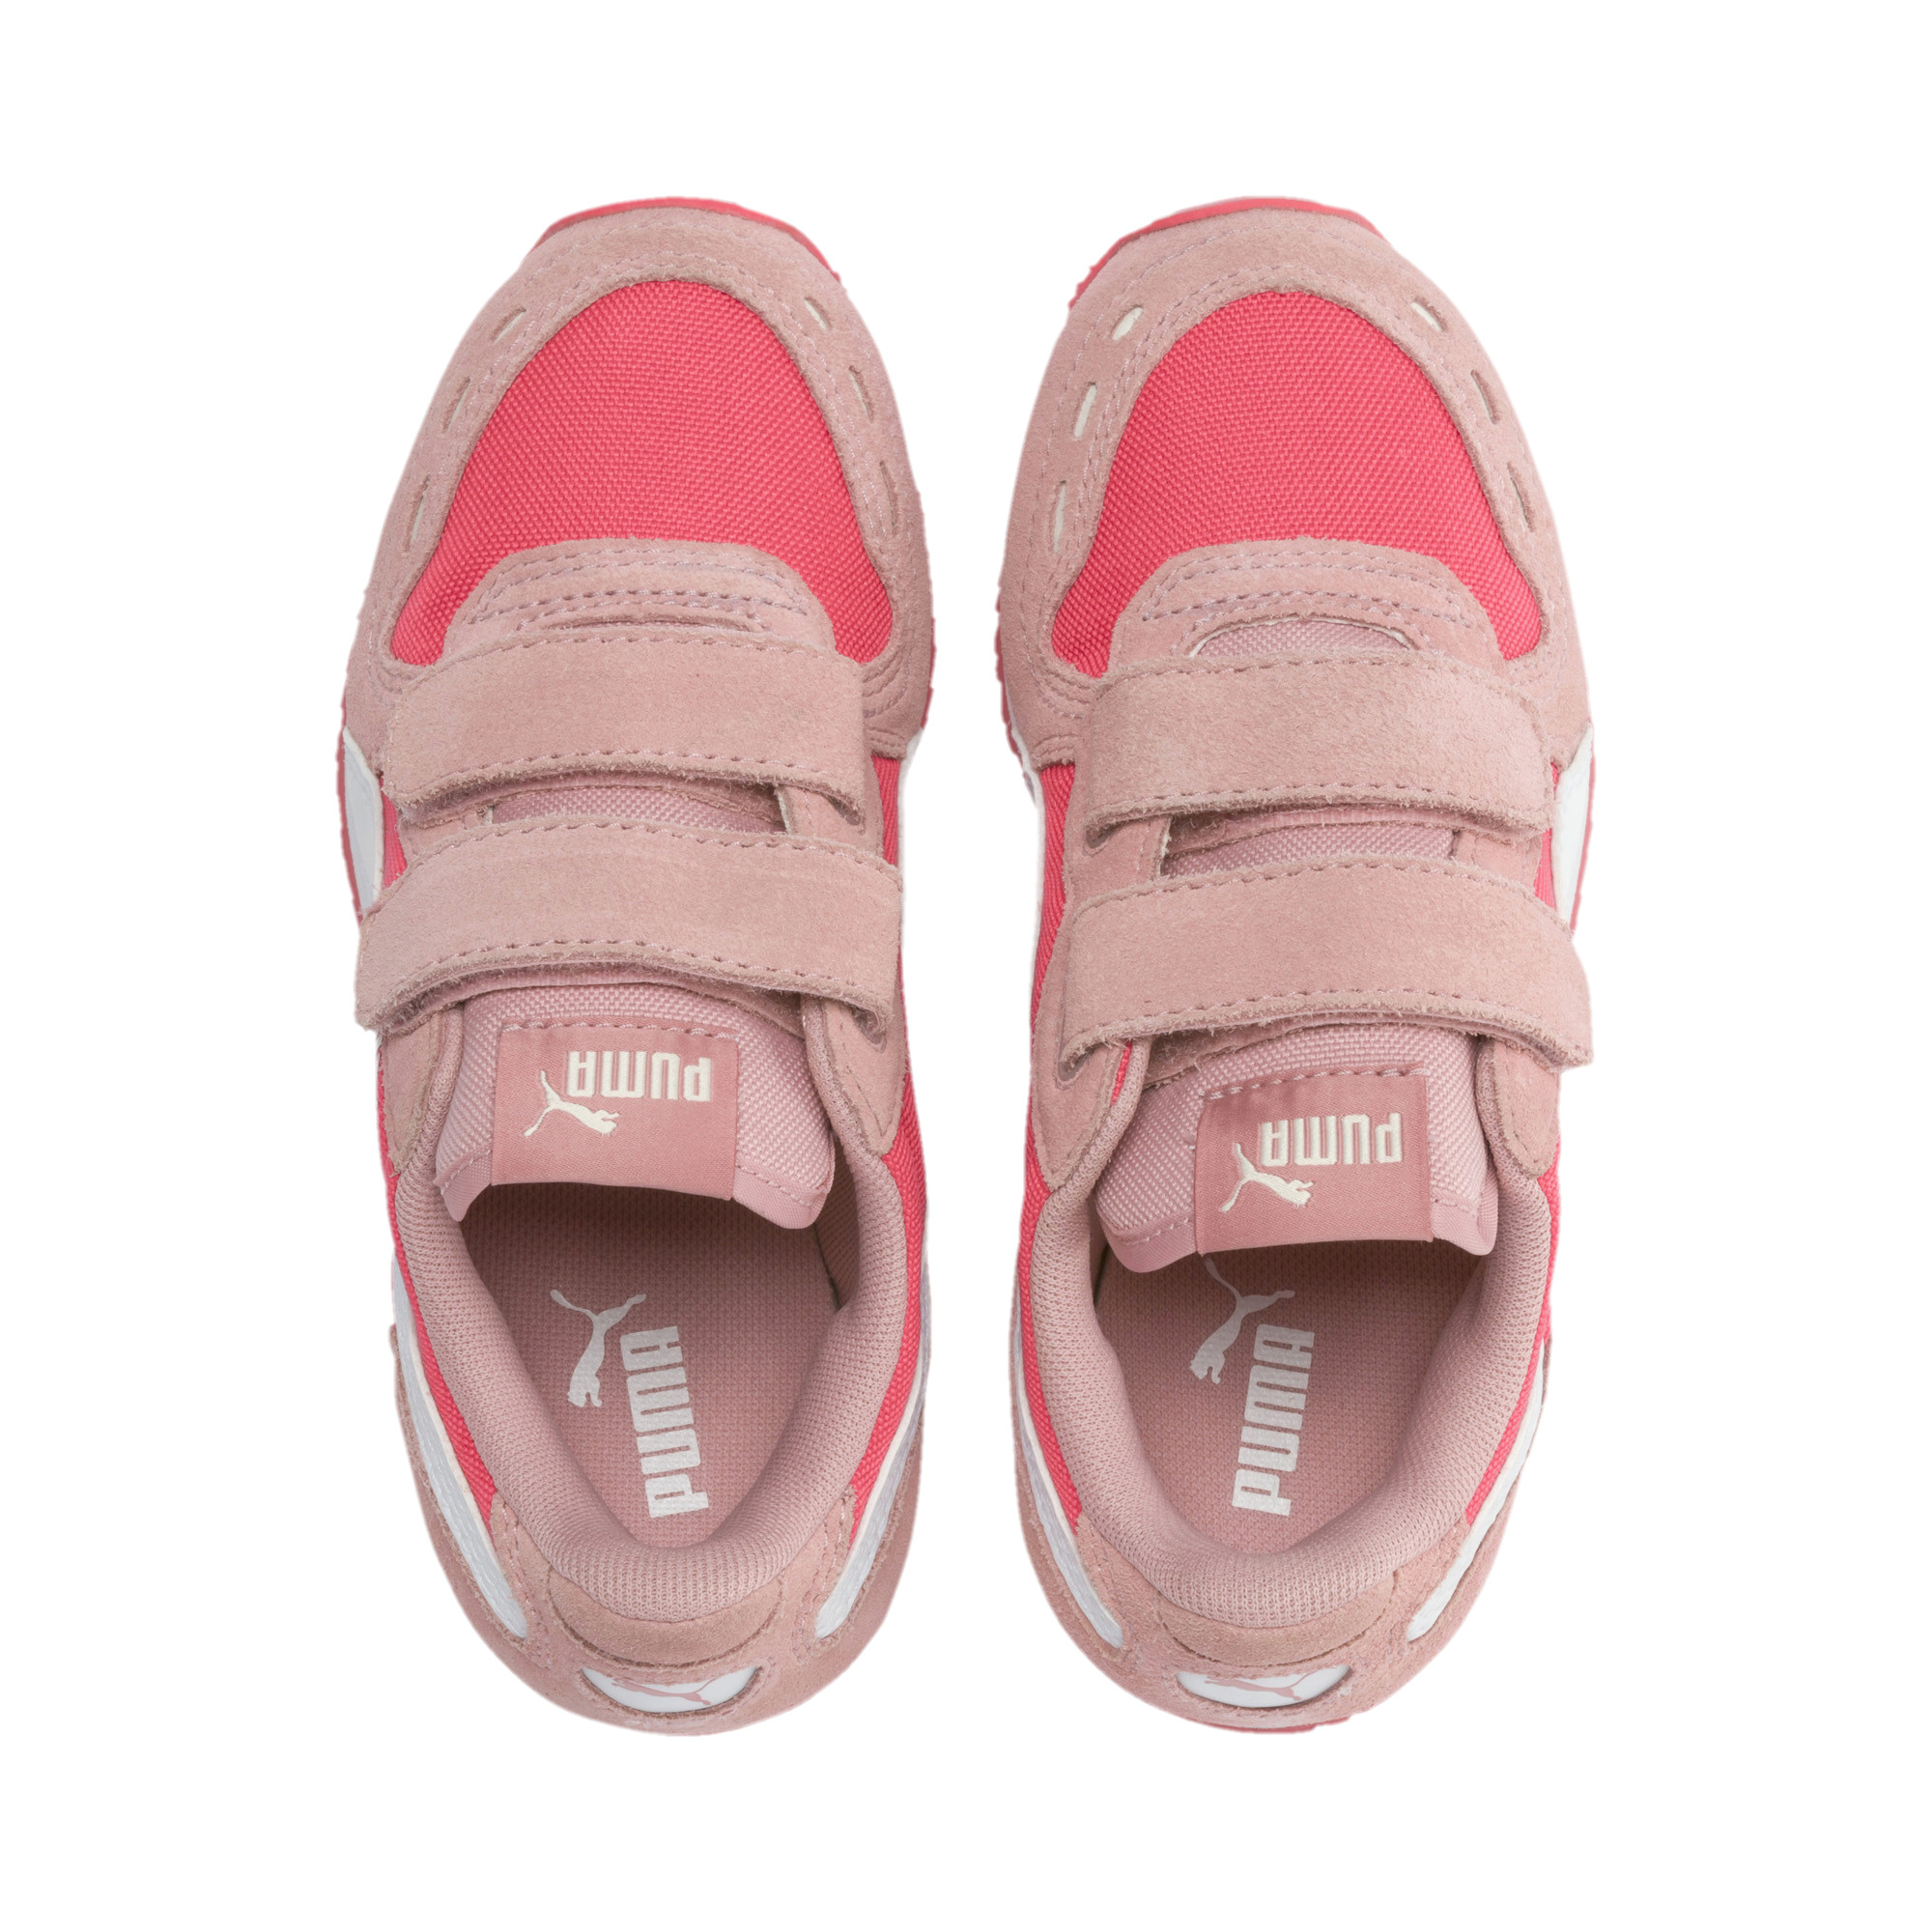 PUMA-Cabana-Racer-Little-Kids-039-Shoes-Kids-Shoe-Kids thumbnail 18